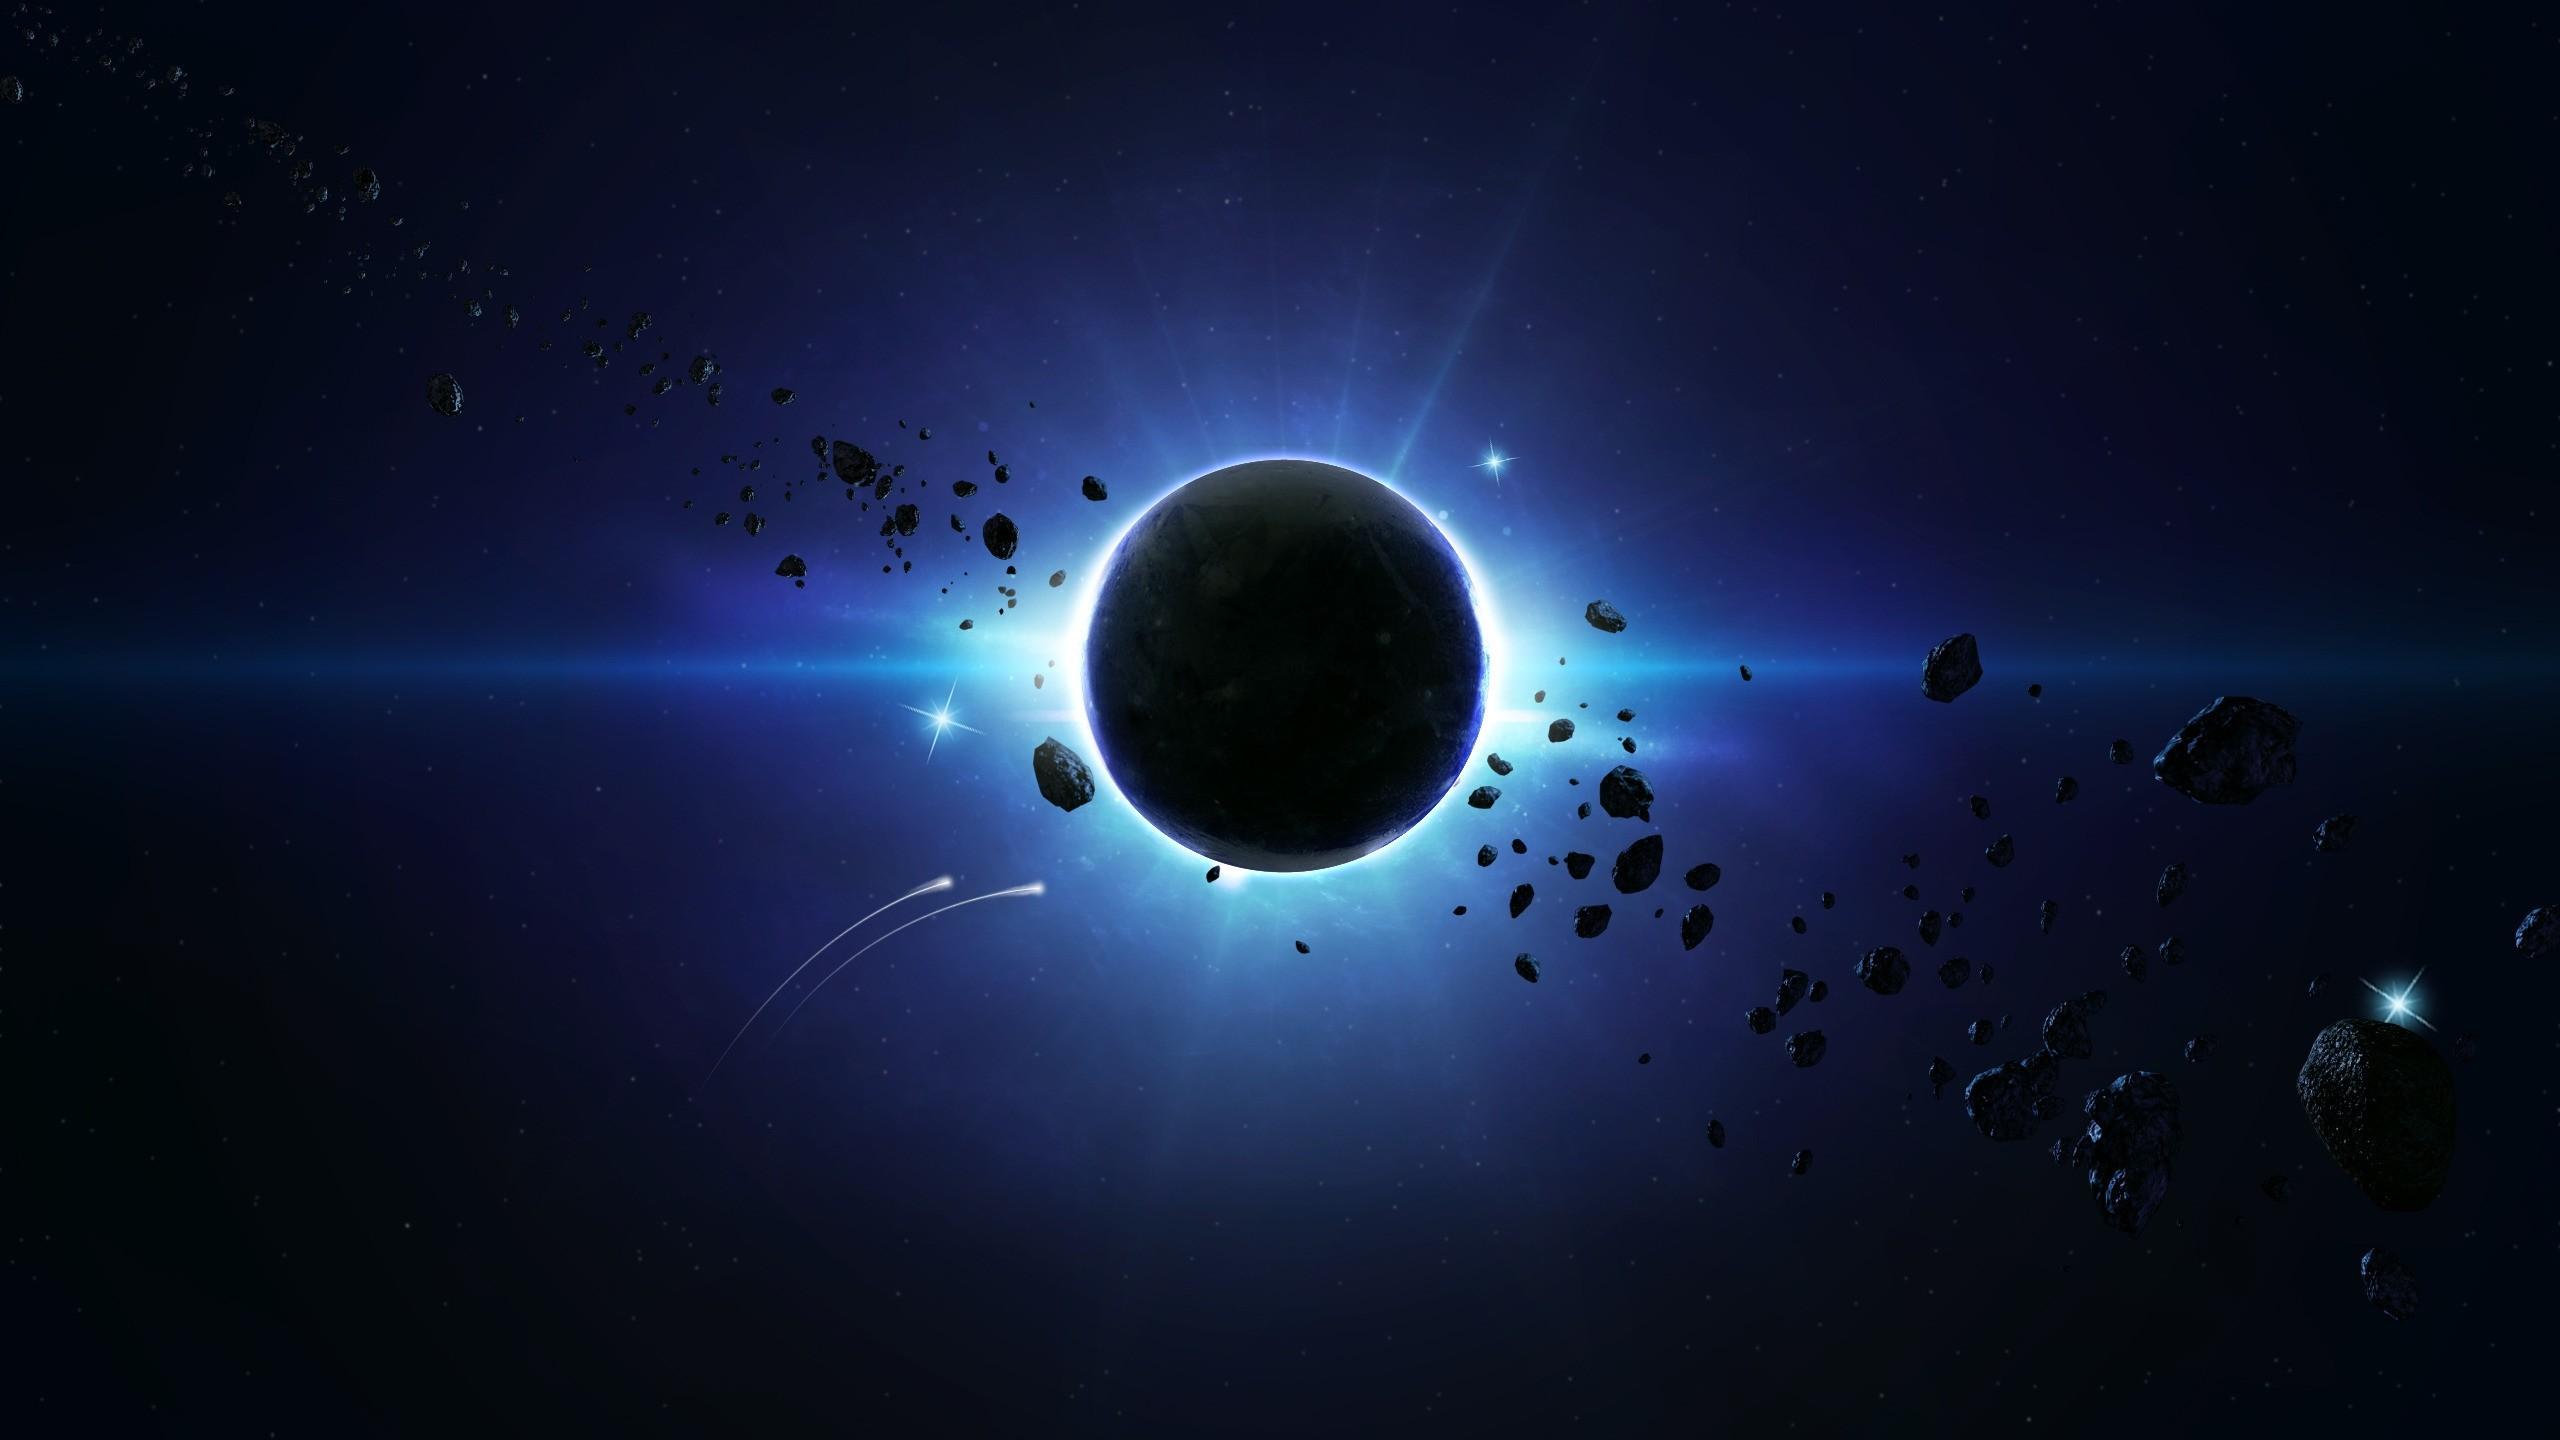 nebula, Stars, Space, TylerCreatesWorlds, Space Art Wallpapers HD .